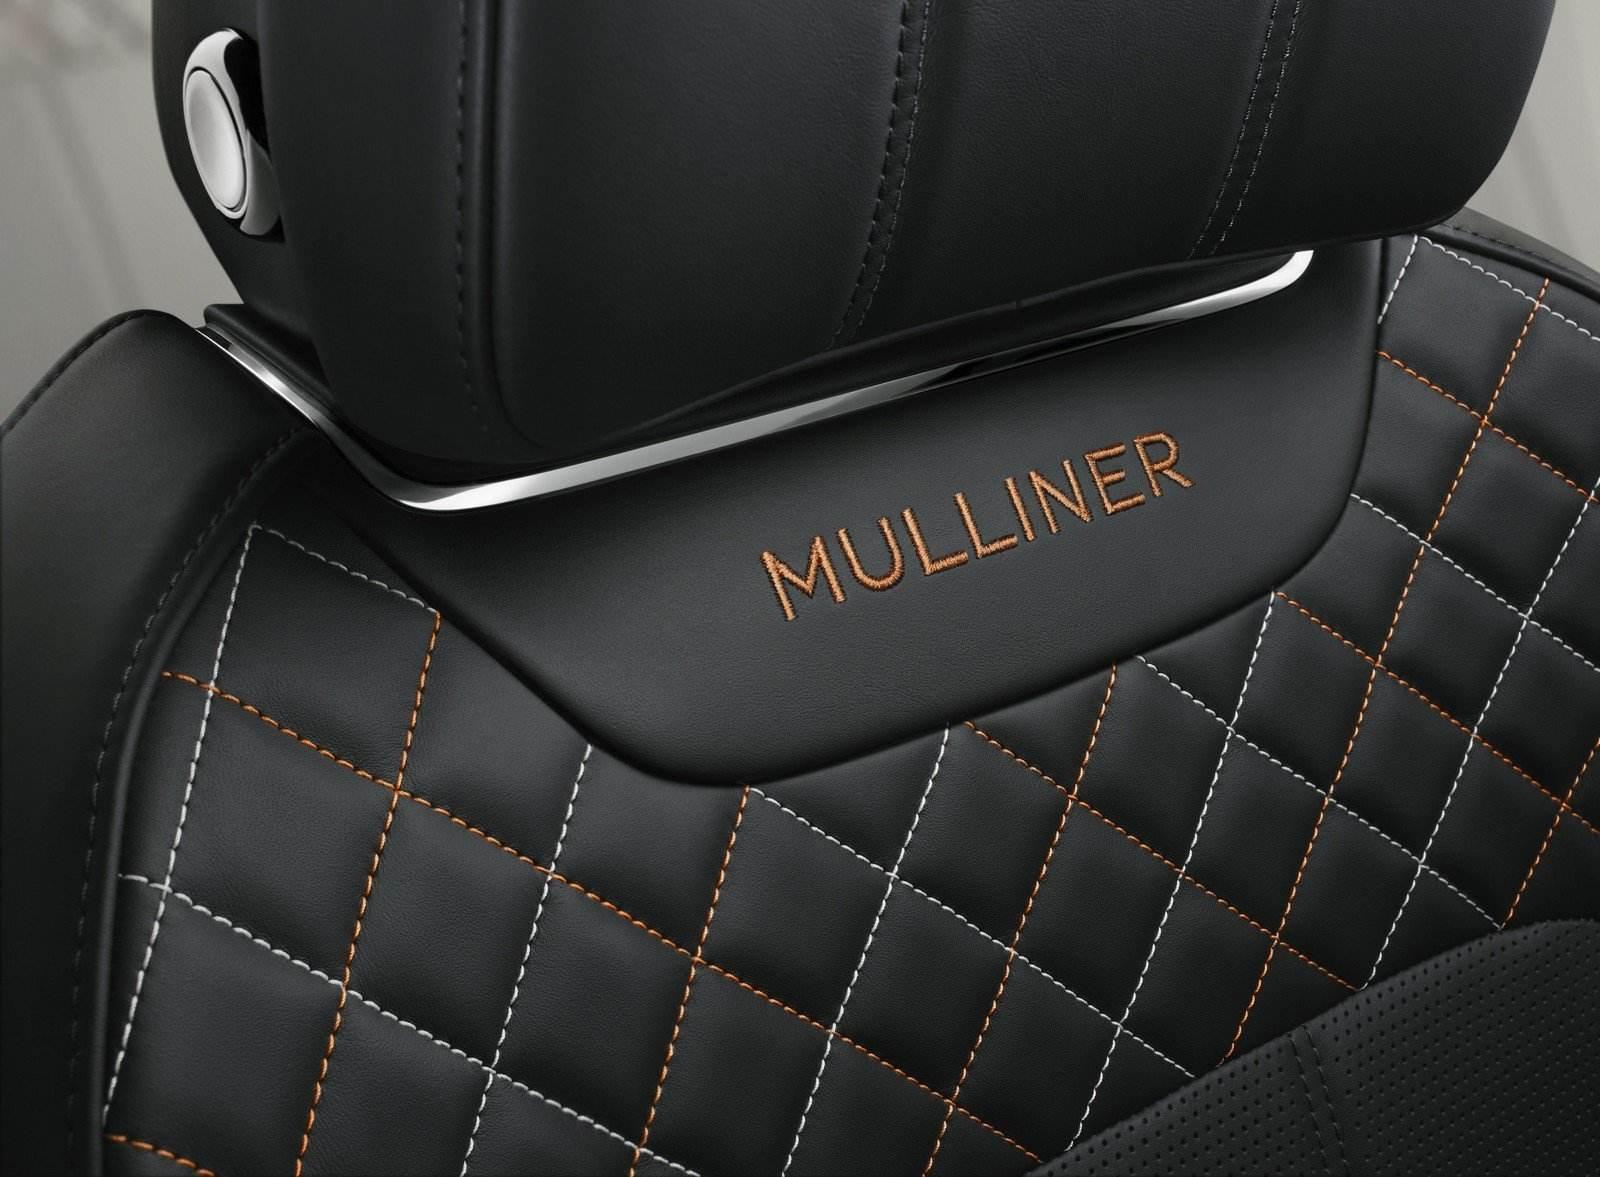 bentayga-mulliner-the-ultimate-luxury-suv-4